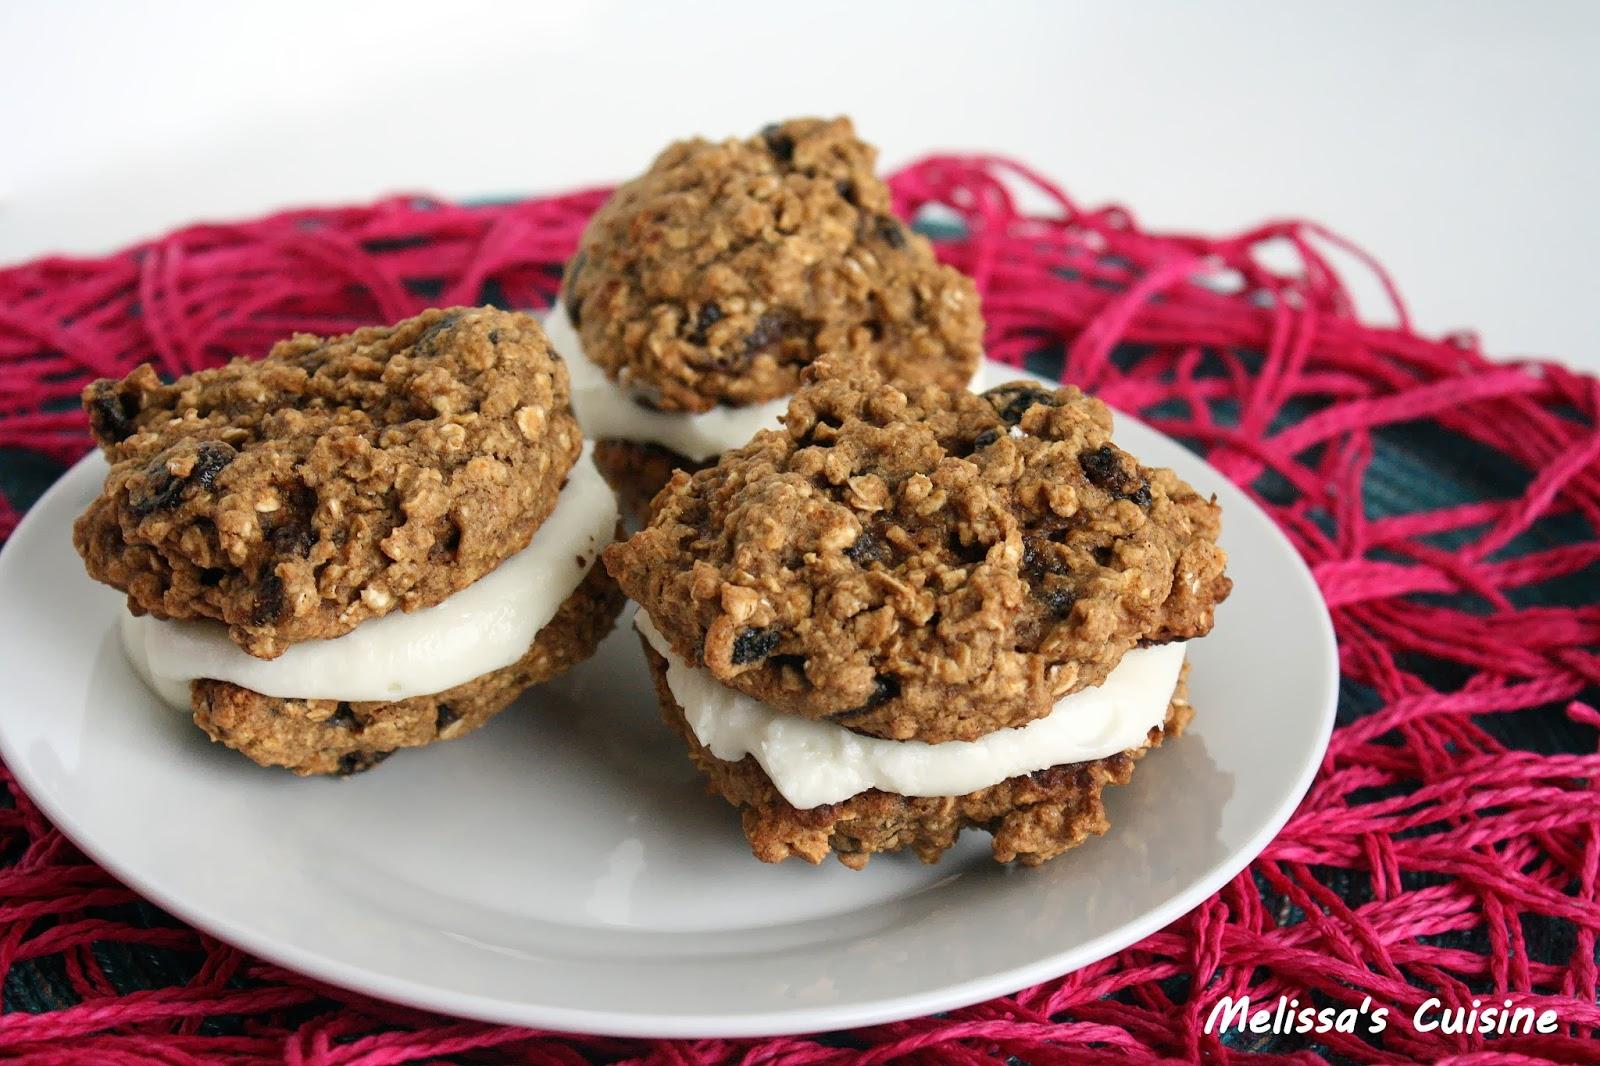 Melissa's Cuisine: Oatmeal Raisin Whoopie Pies